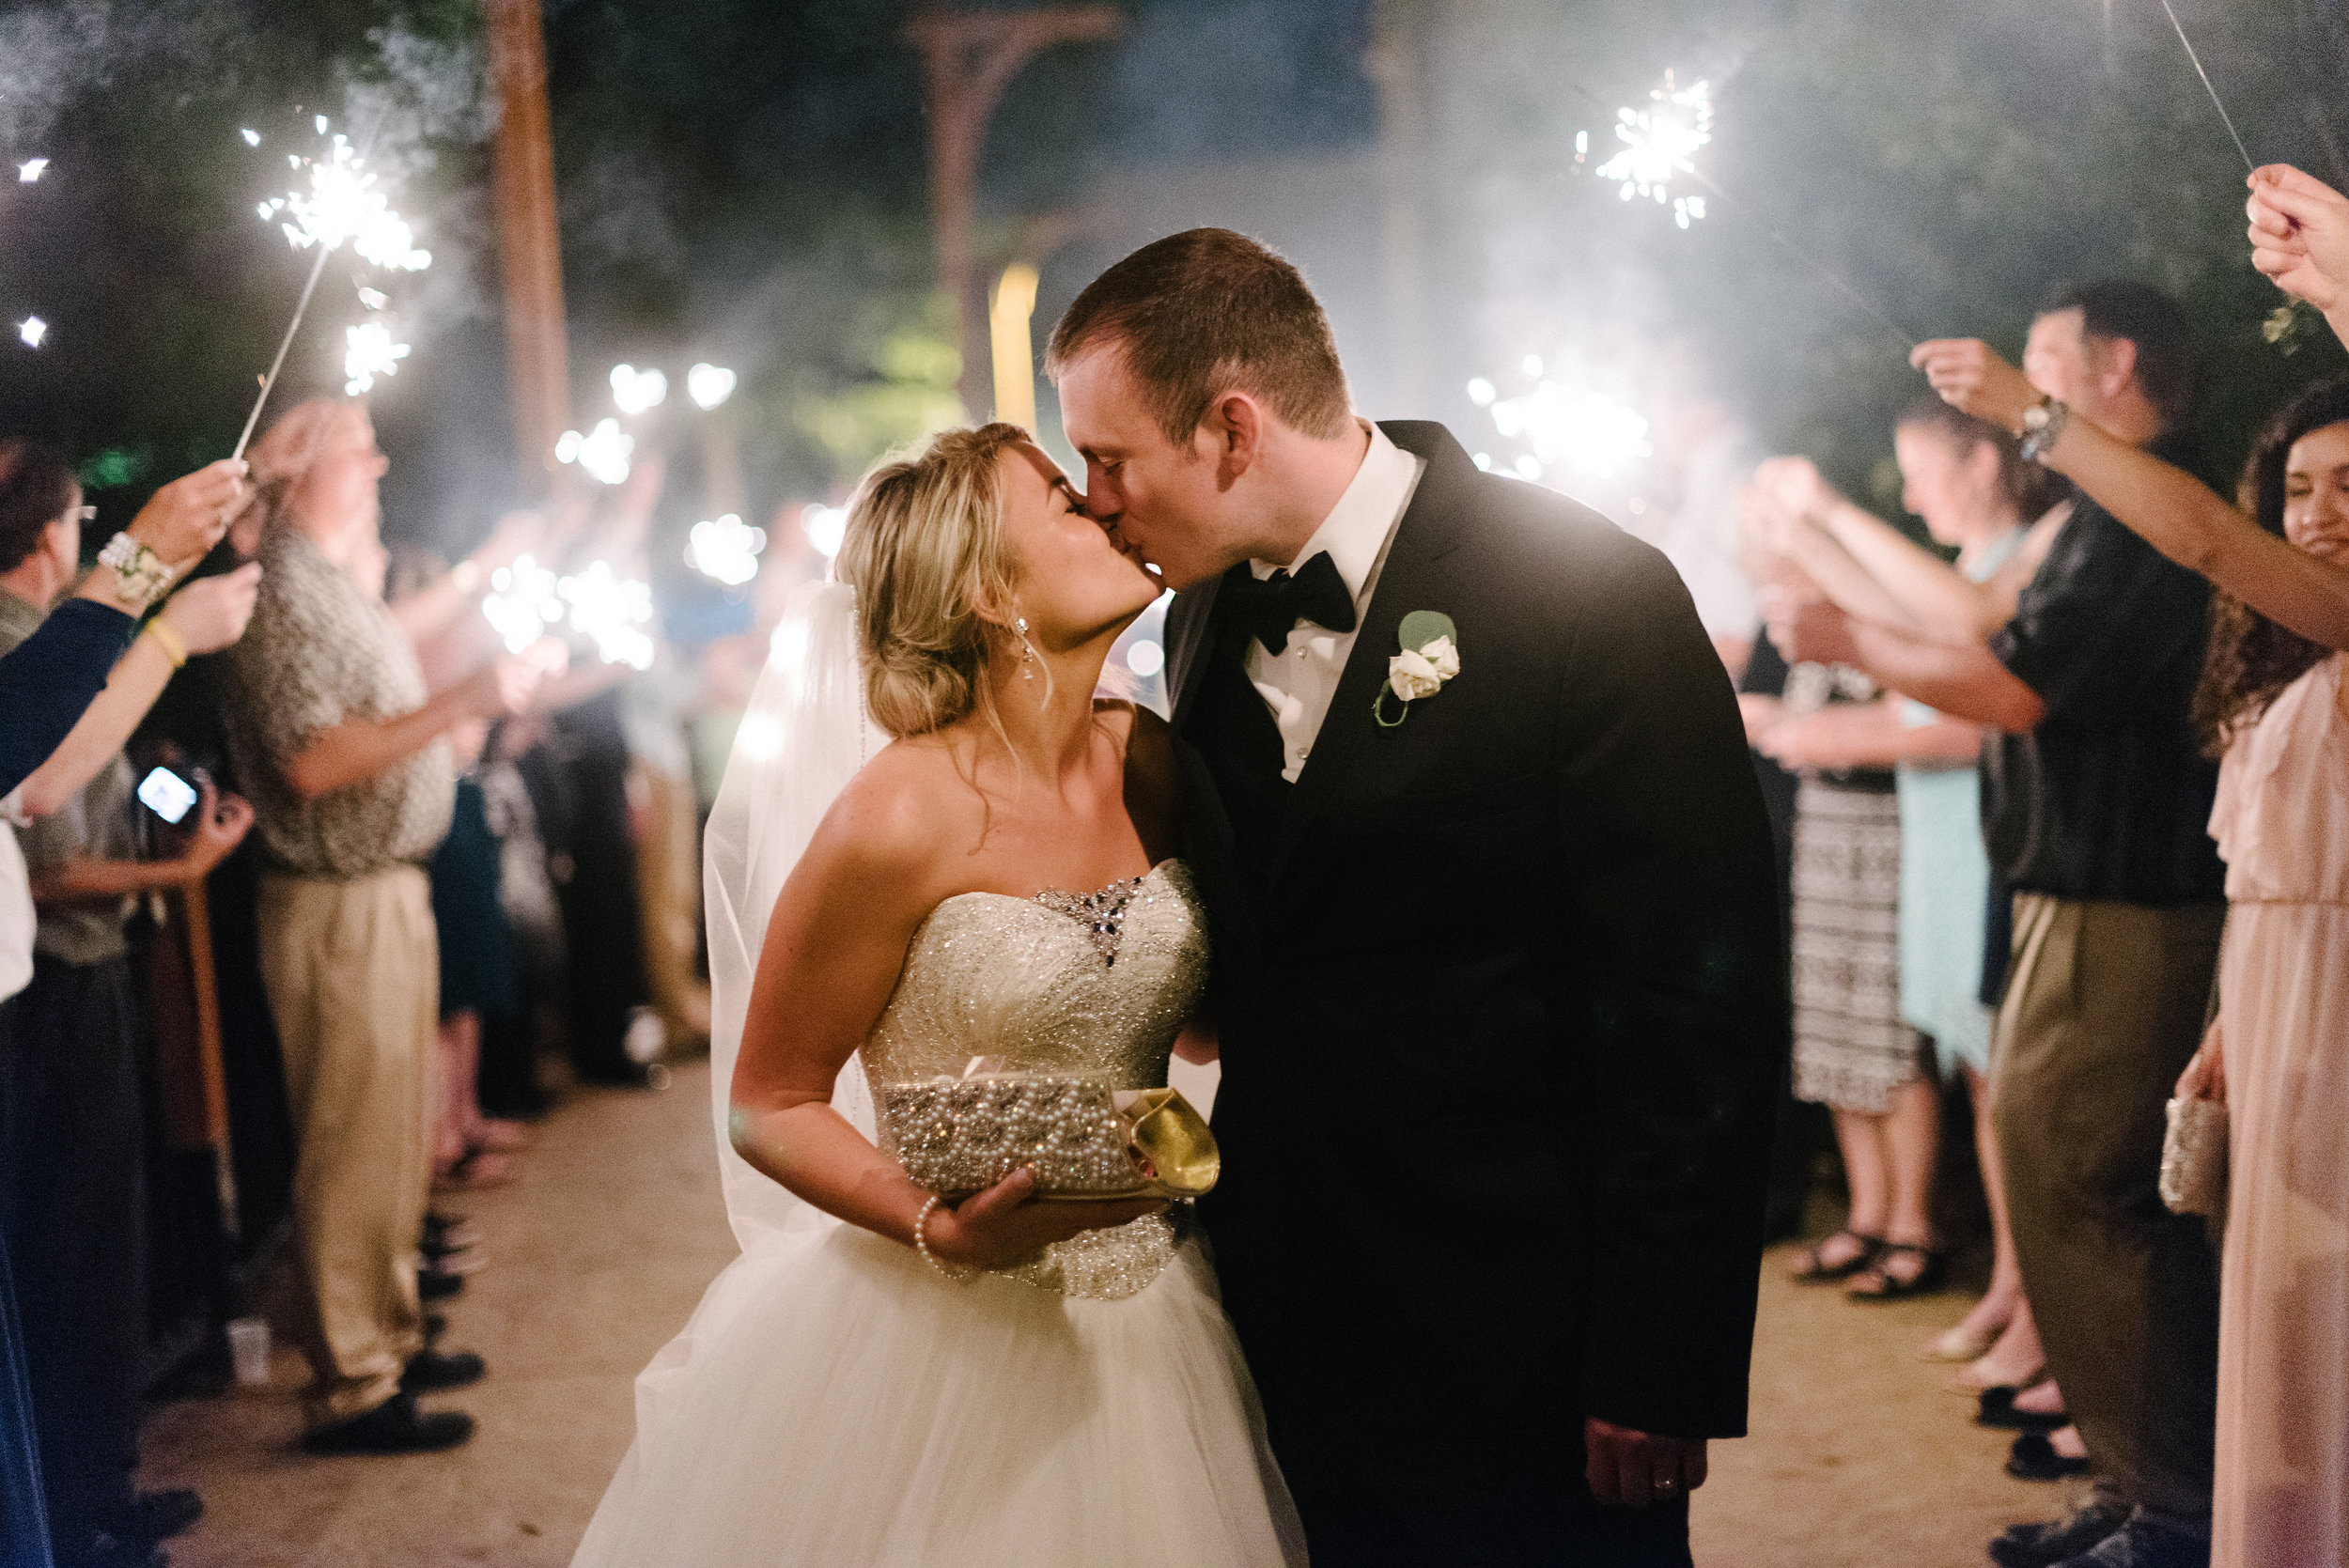 Chula vista resort wedding, sparkler exit destination wisconsin wedding, wisconsin dells wedding planner